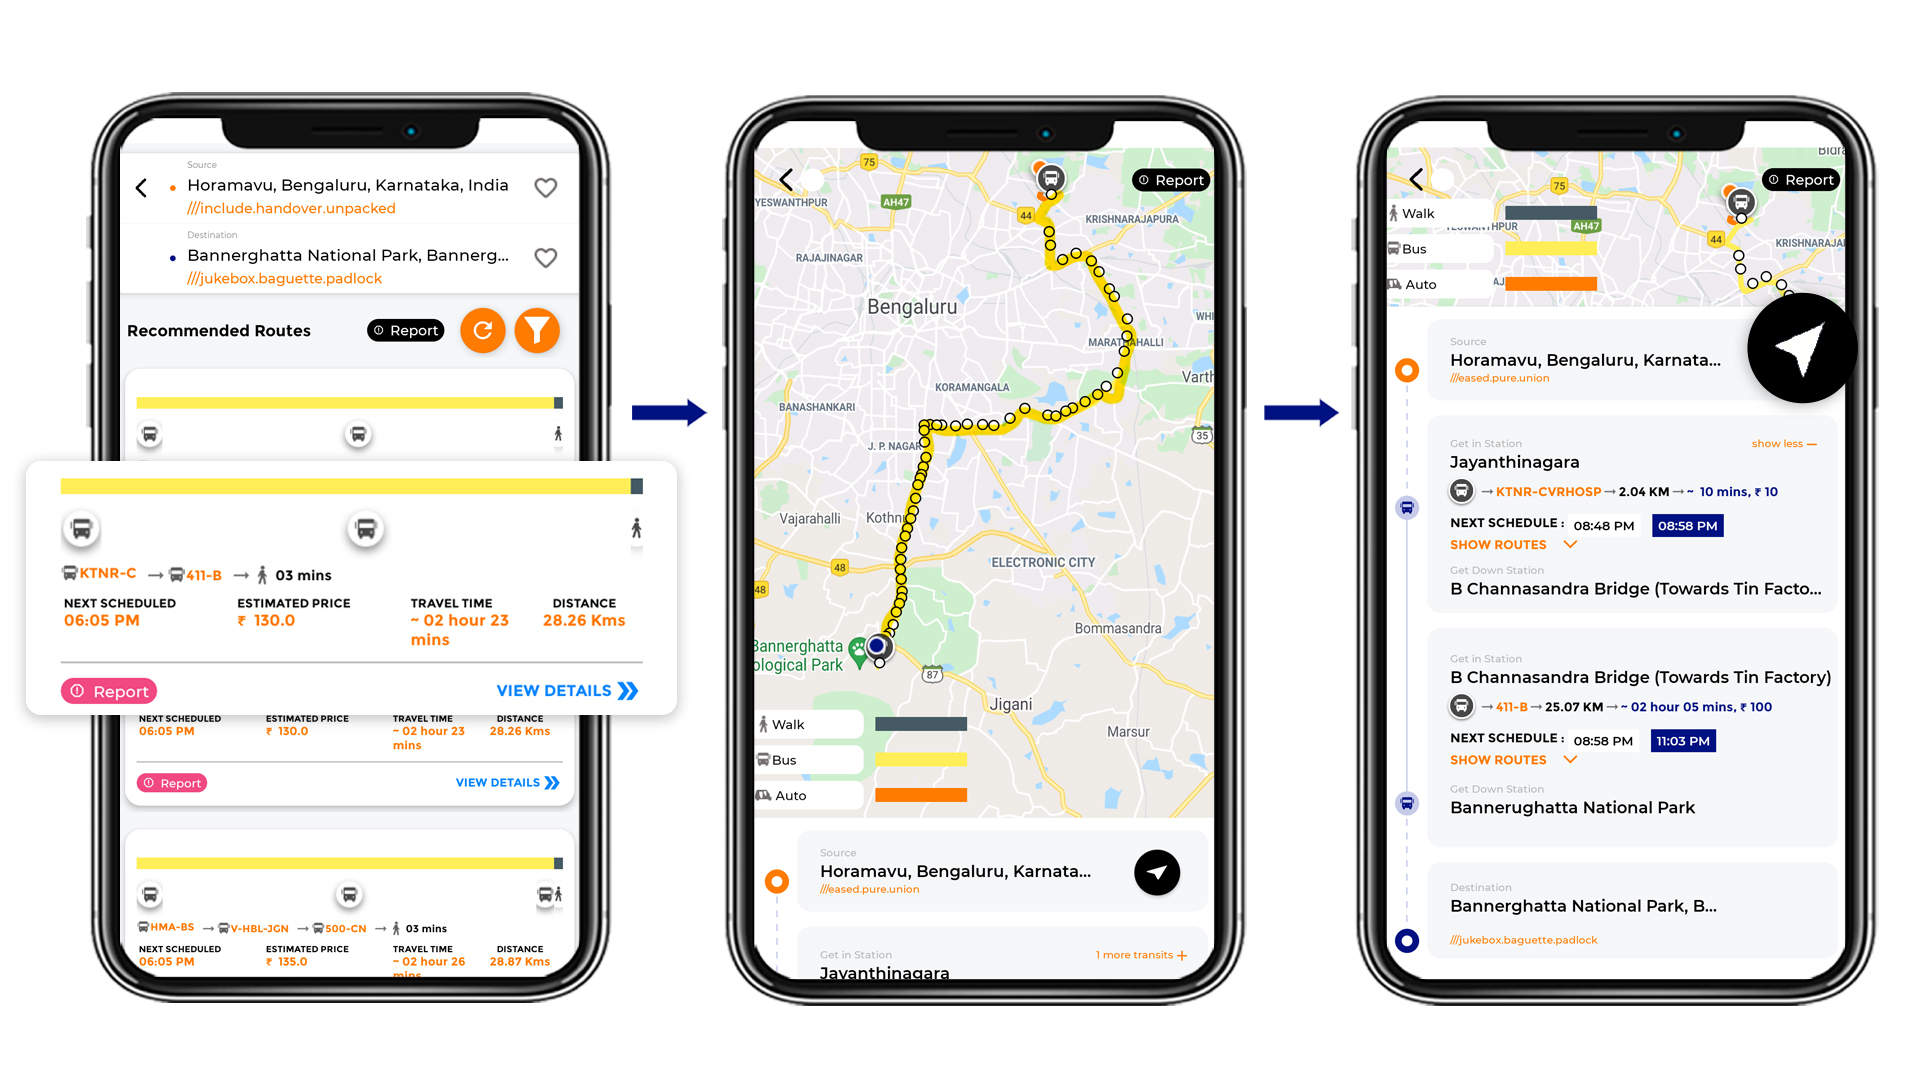 Tummoc, Tummoc app, Bannerghatta National Park, Public transport information, Horamavu